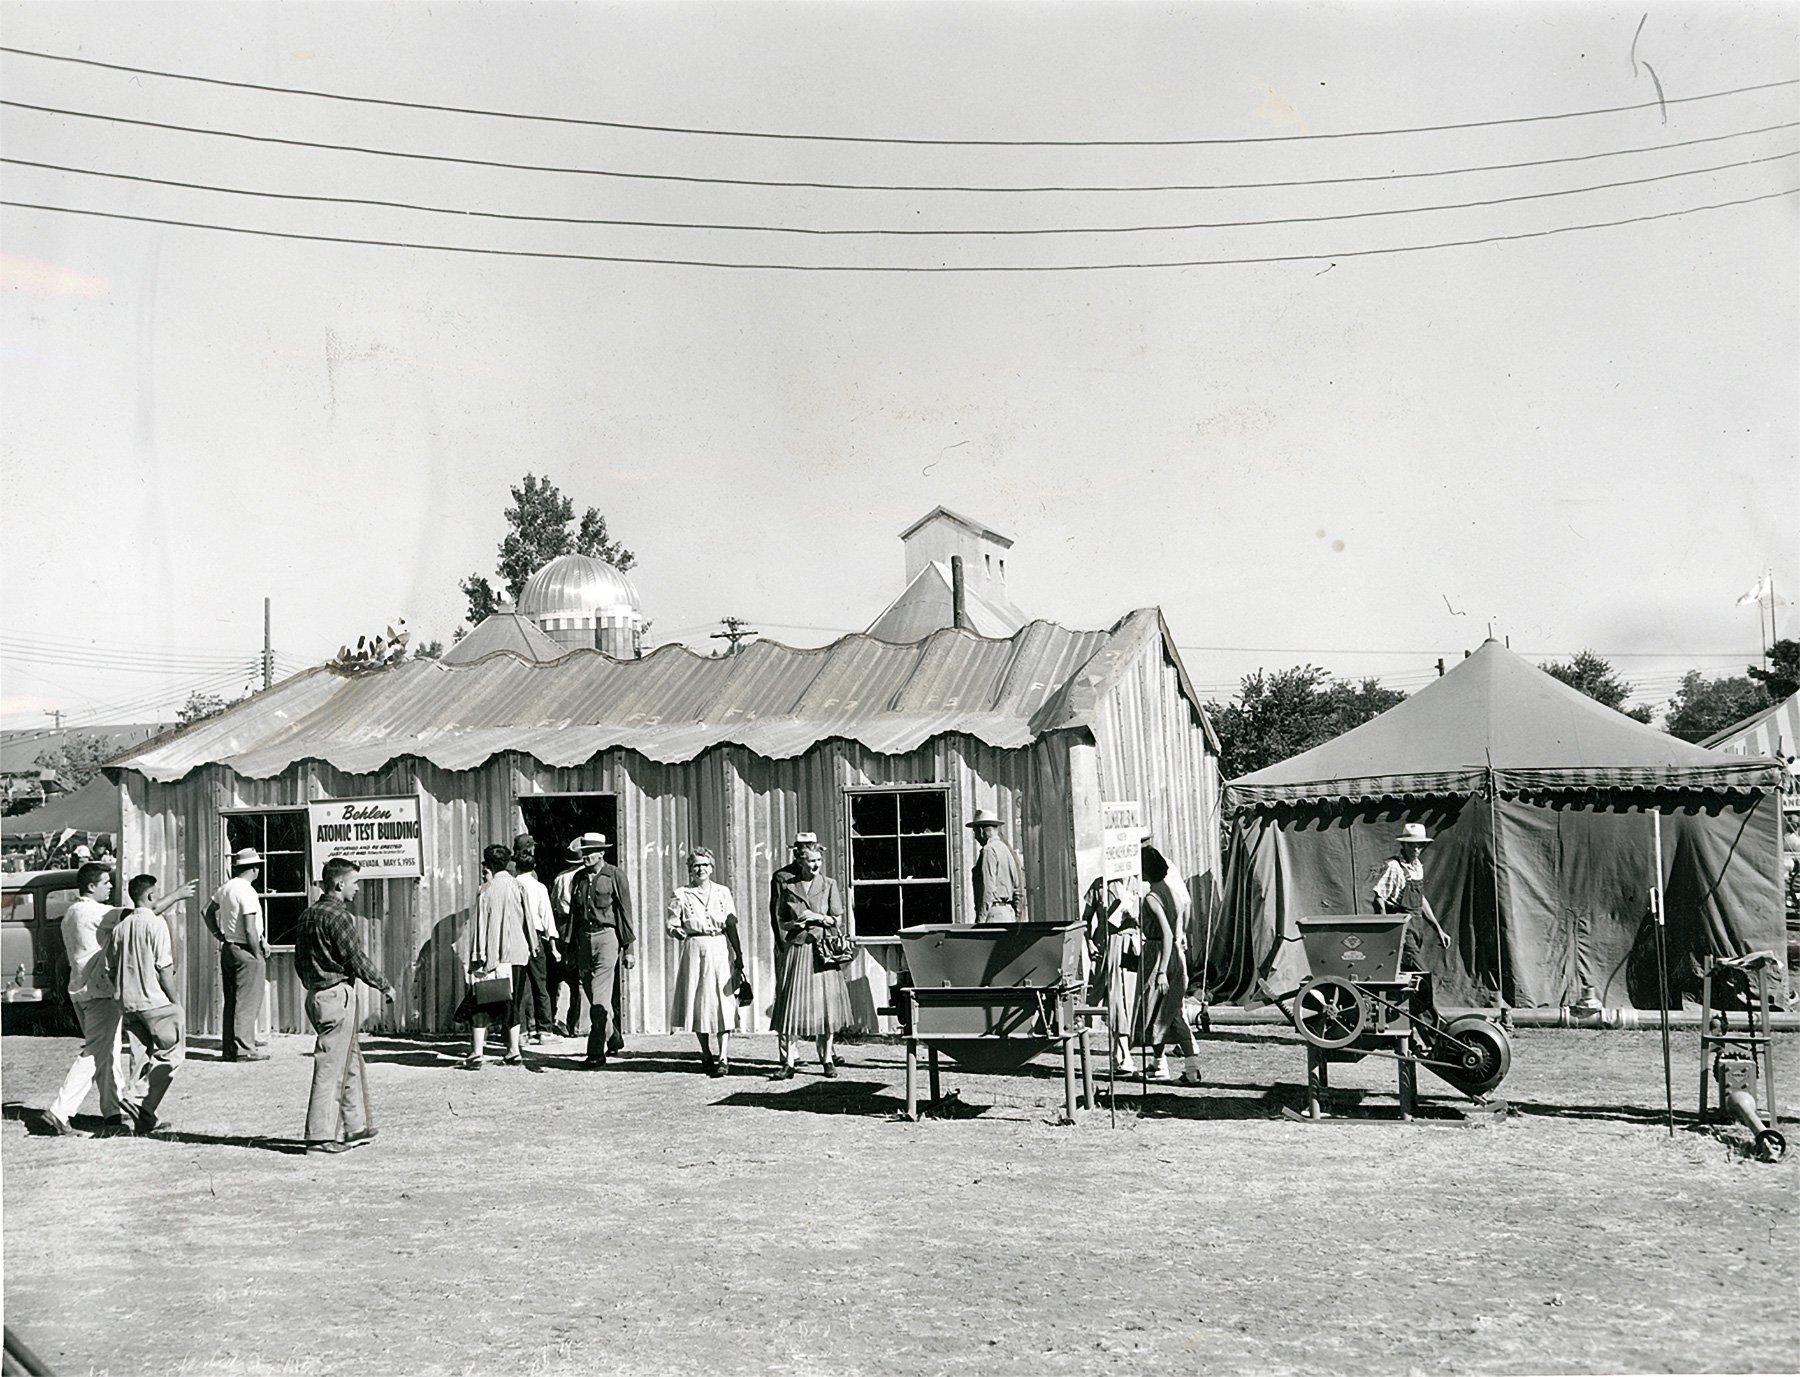 Images:  Behlen Manufacturing Atomic Test Building, Nebraska State Fair, 1955, courtesy of   Nebraska State Historical Society